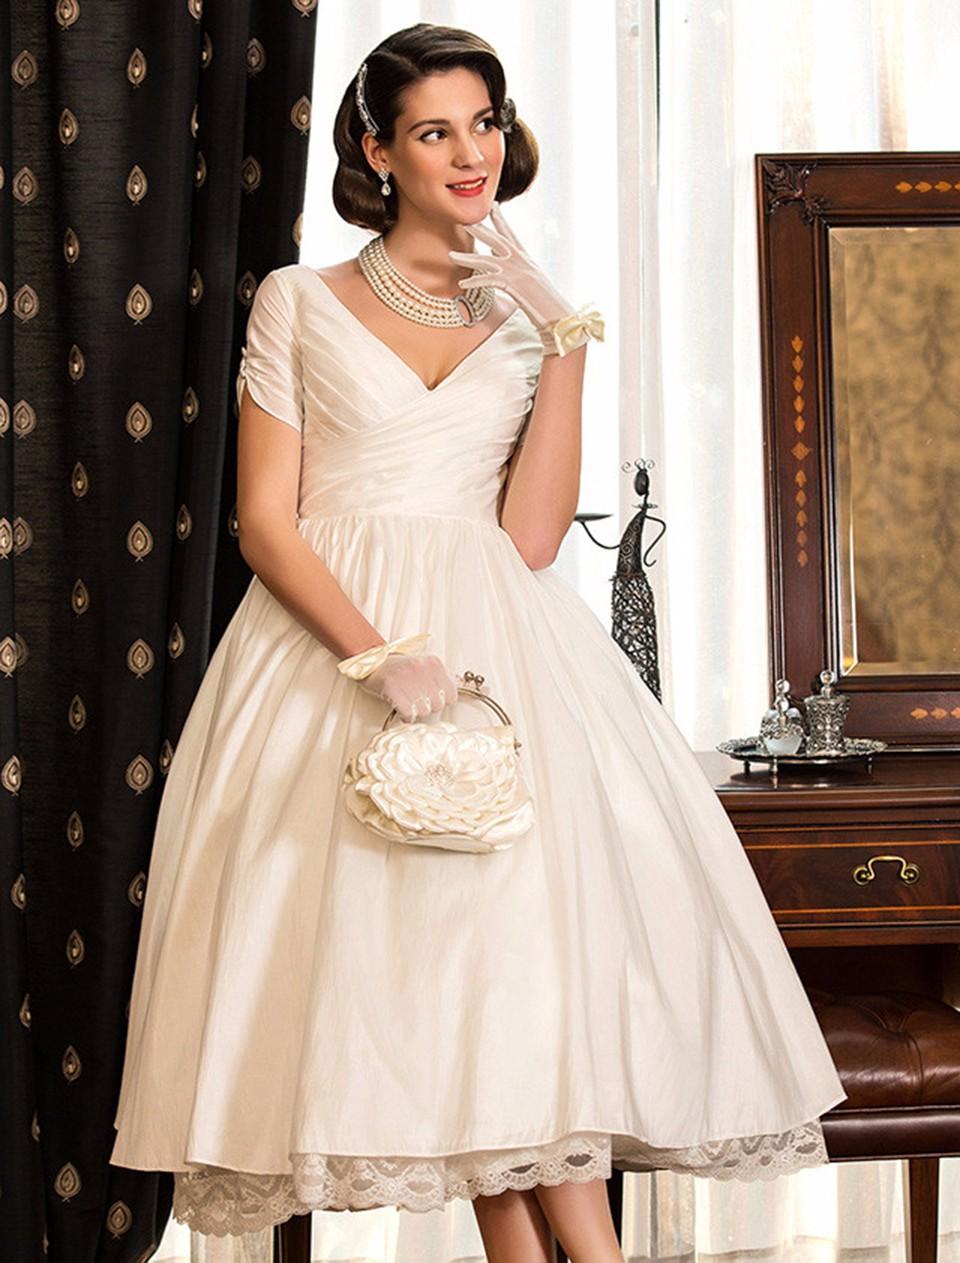 8dacf664ffe1 Simple Vintage Short Wedding Dresses 2016 V Neck Short Sleeve Lace Pleat Tea  Length Wedding Dress Casual Satin Bridal Gowns PA55